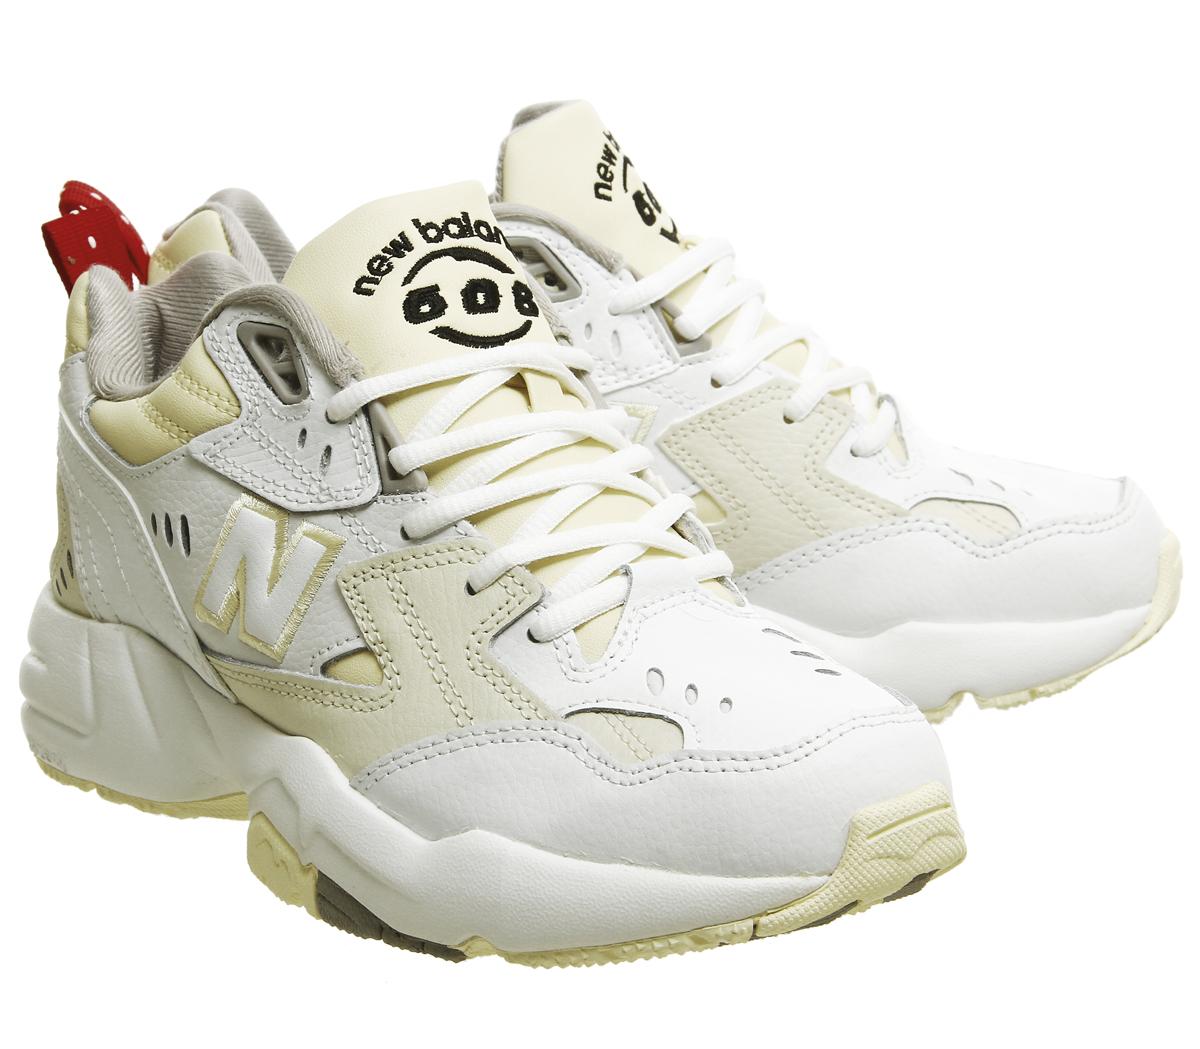 0f61b2c38ace3 Womens New Balance 608 Trainers White Cream Trainers Shoes | eBay